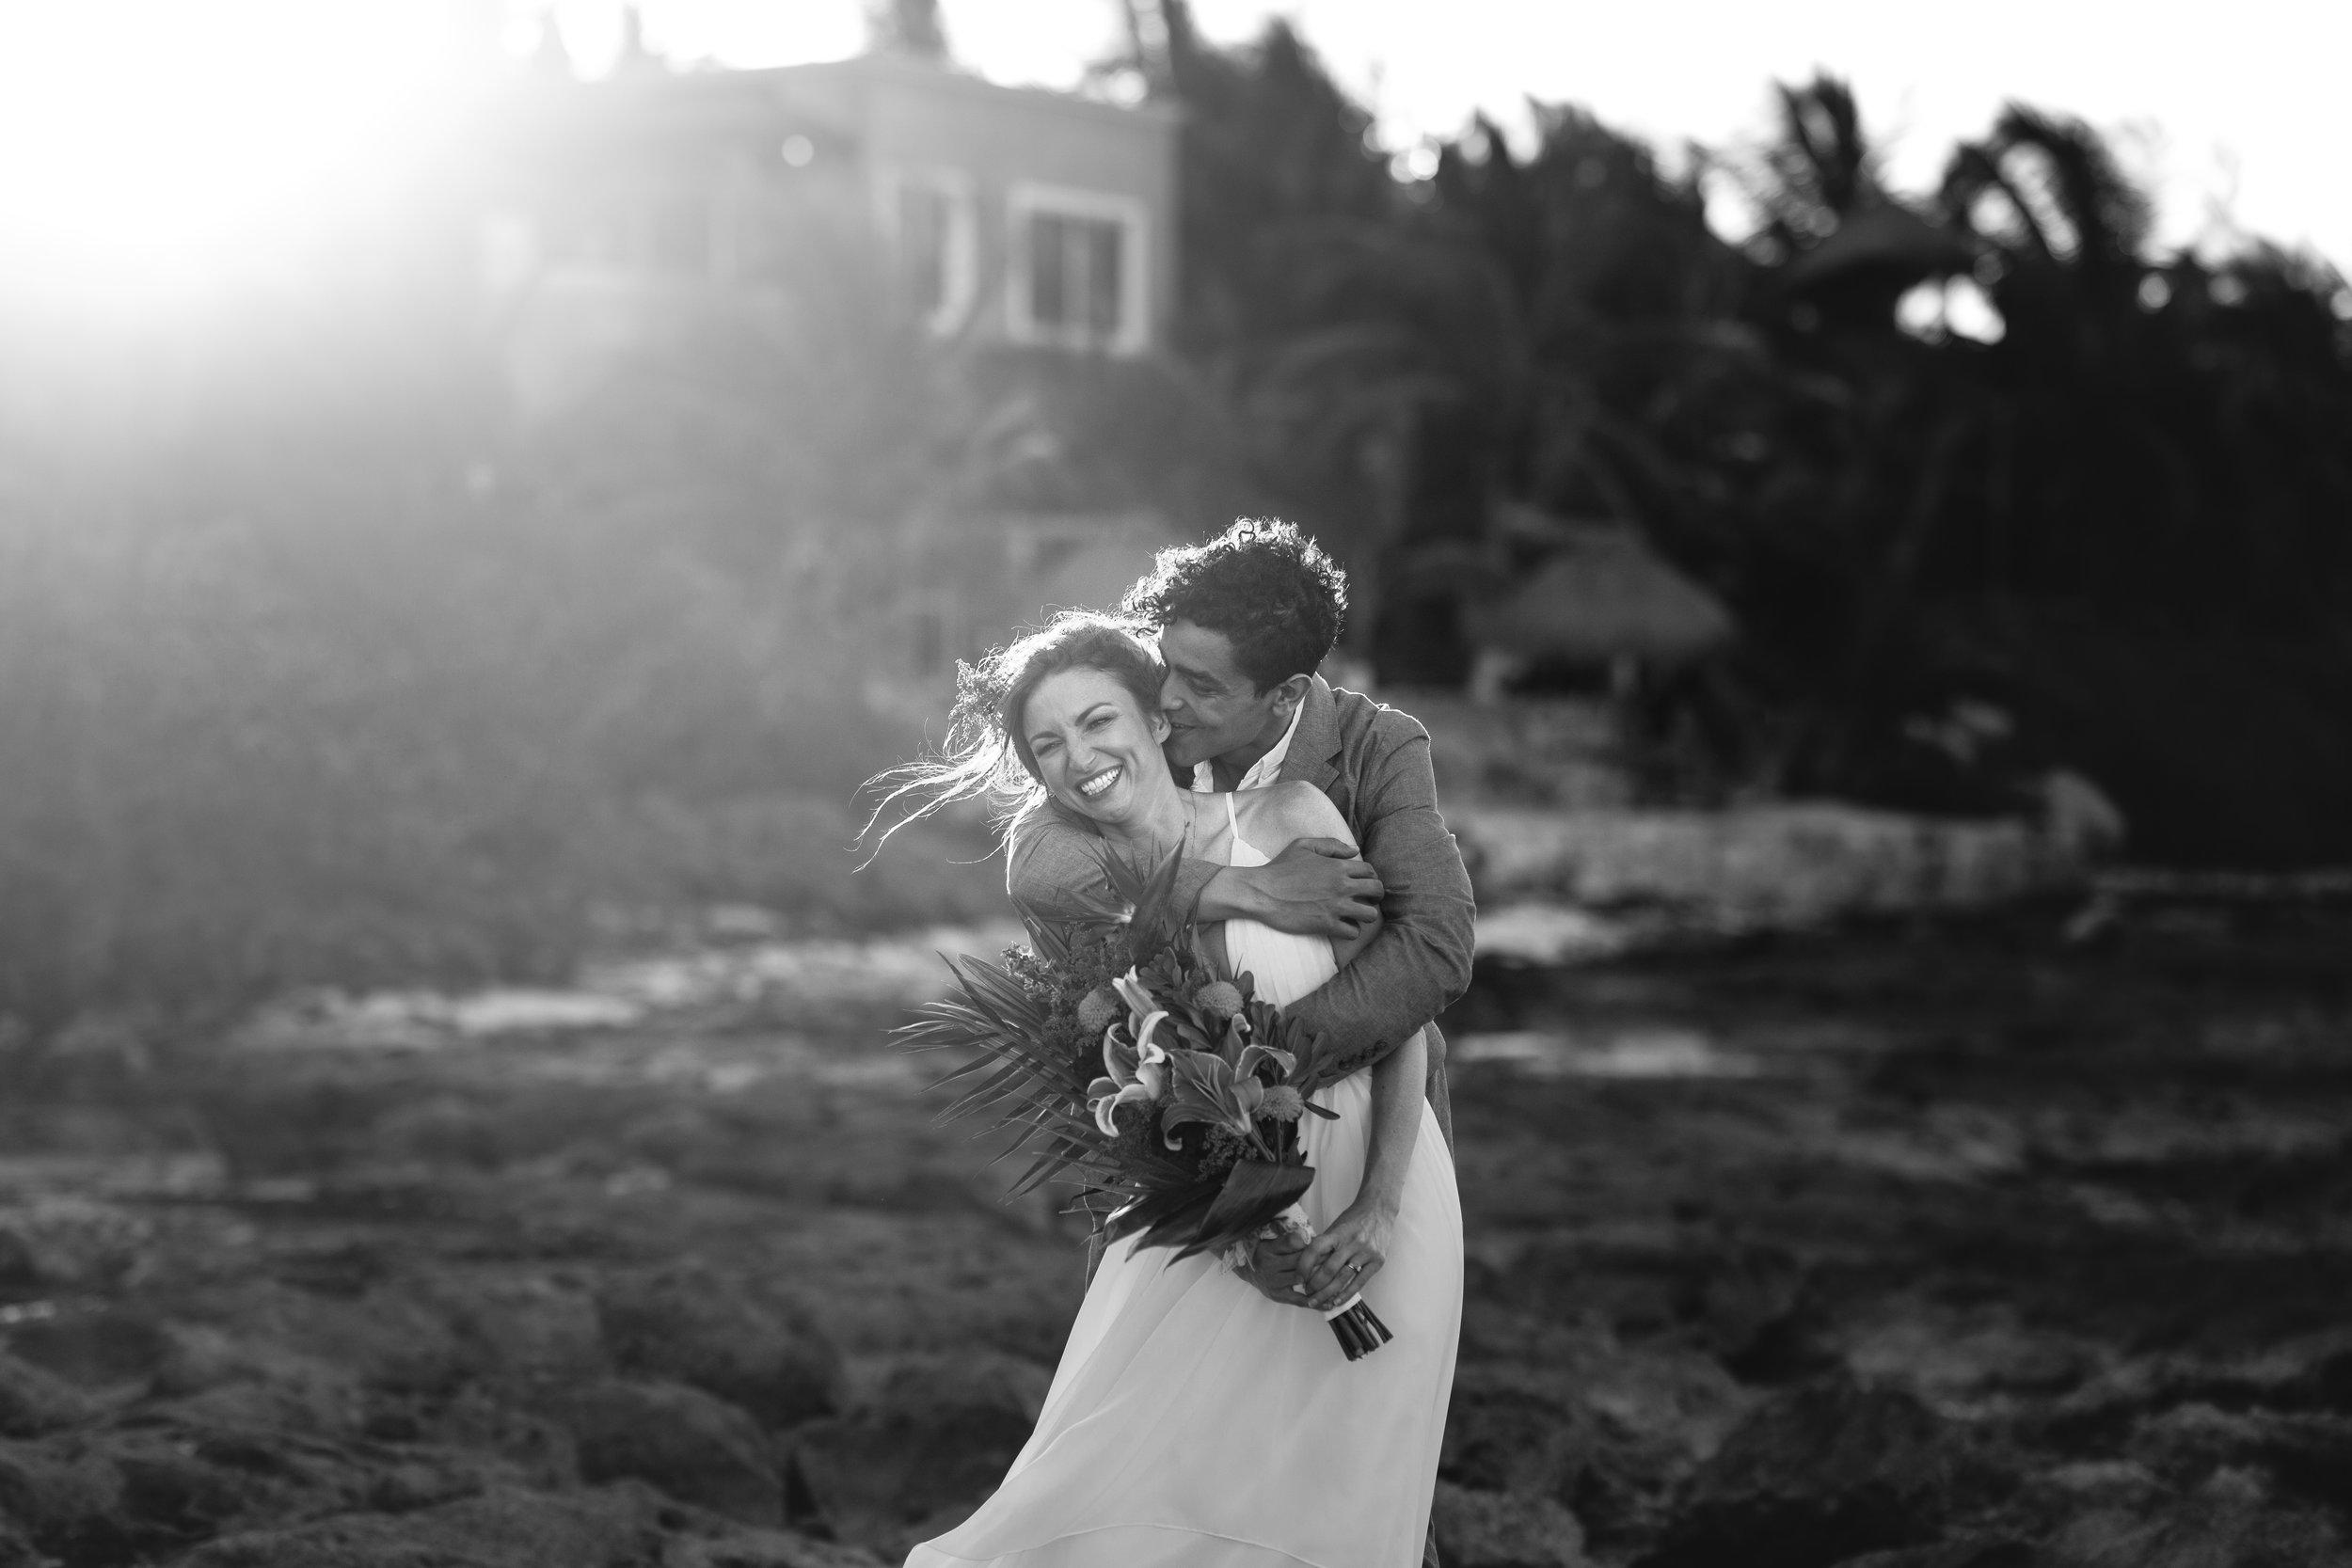 Nicole-Daacke-Photography-beachfront-akumal-destionation-wedding-tulum-mexico-elopement-photographer-destination-wedding-inspiration-sunset-champagne-pop-boho-bride-ocean-tropical-bohemian-tulum-wedding-photos-185.jpg